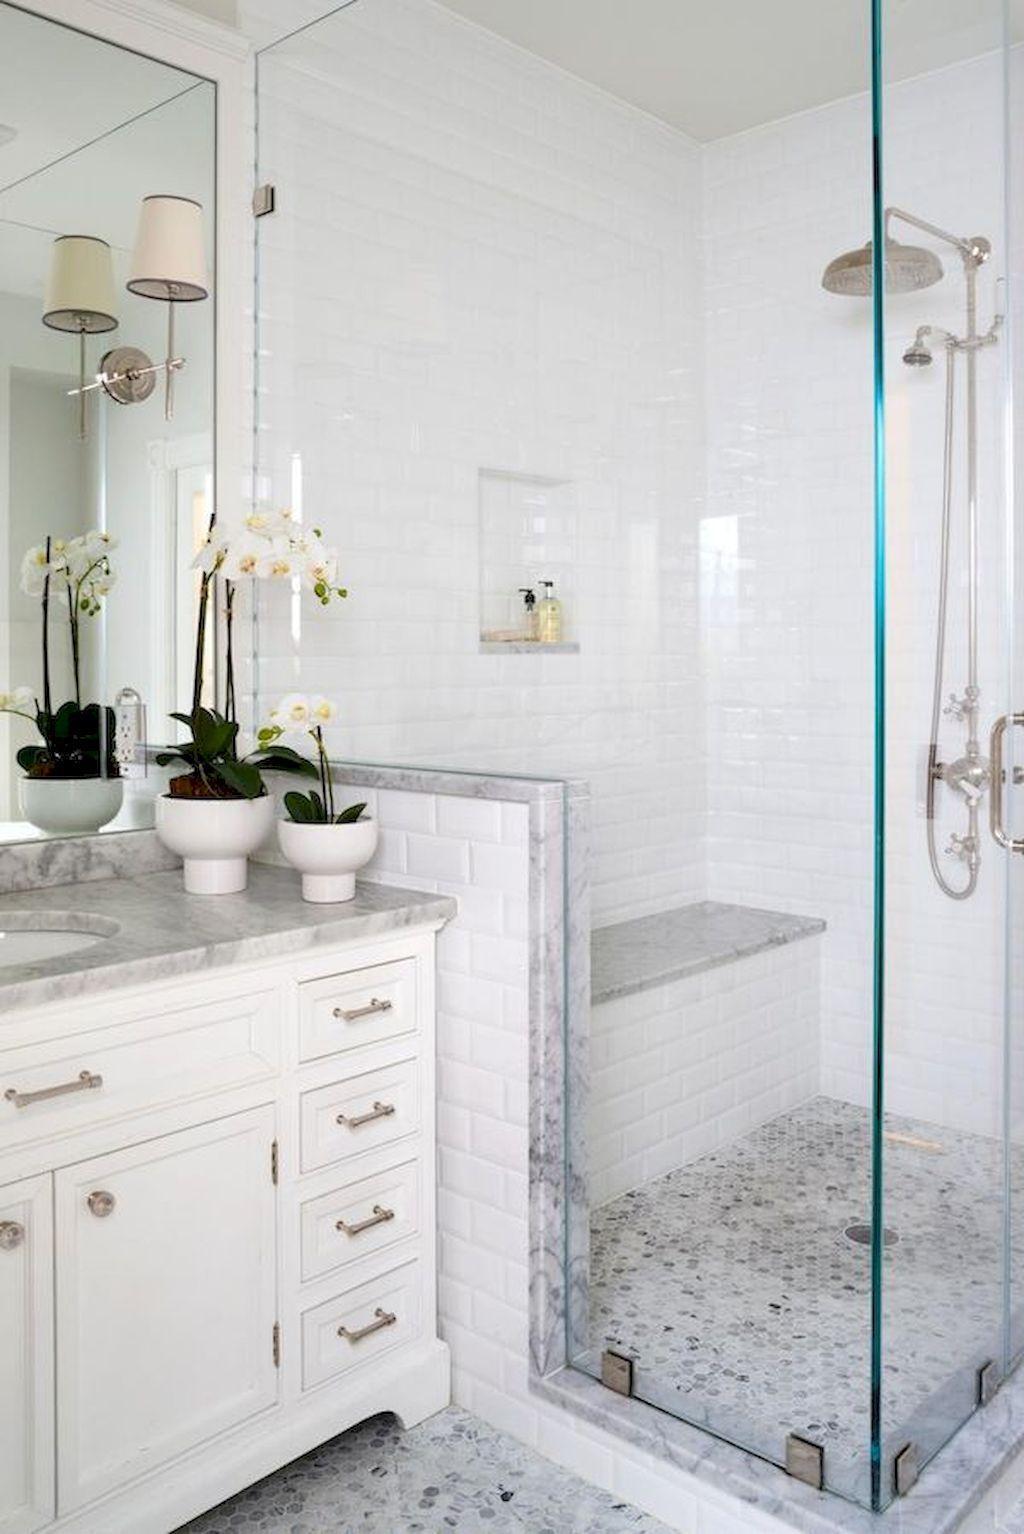 Cool small master bathroom remodel ideas (27) | Bathroom | Pinterest ...